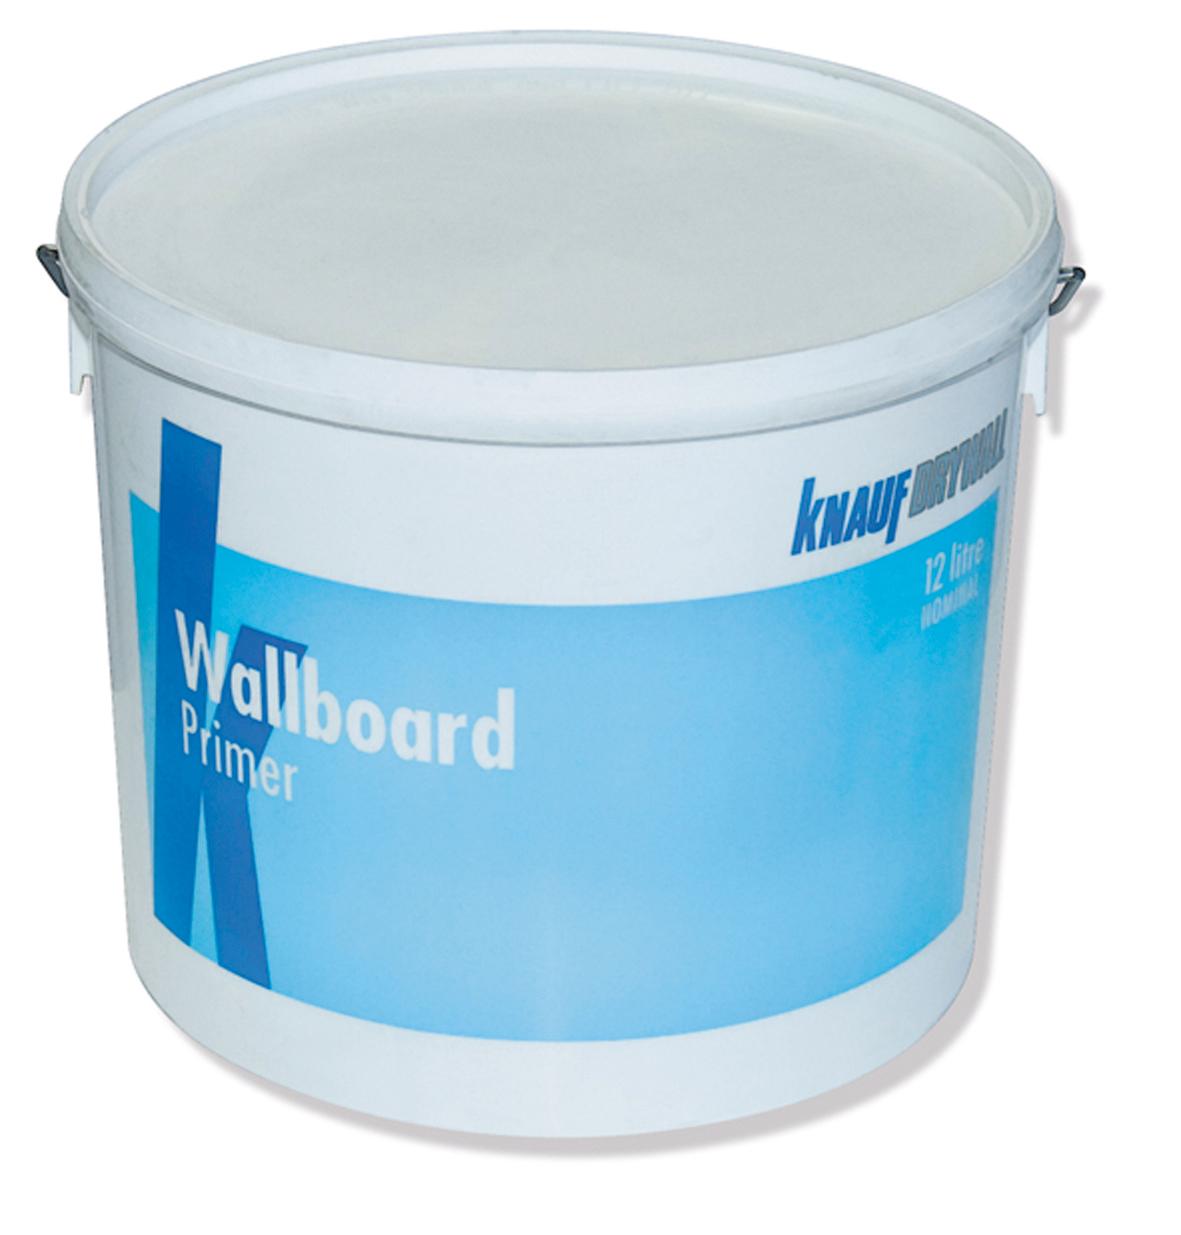 Wallboard Primer